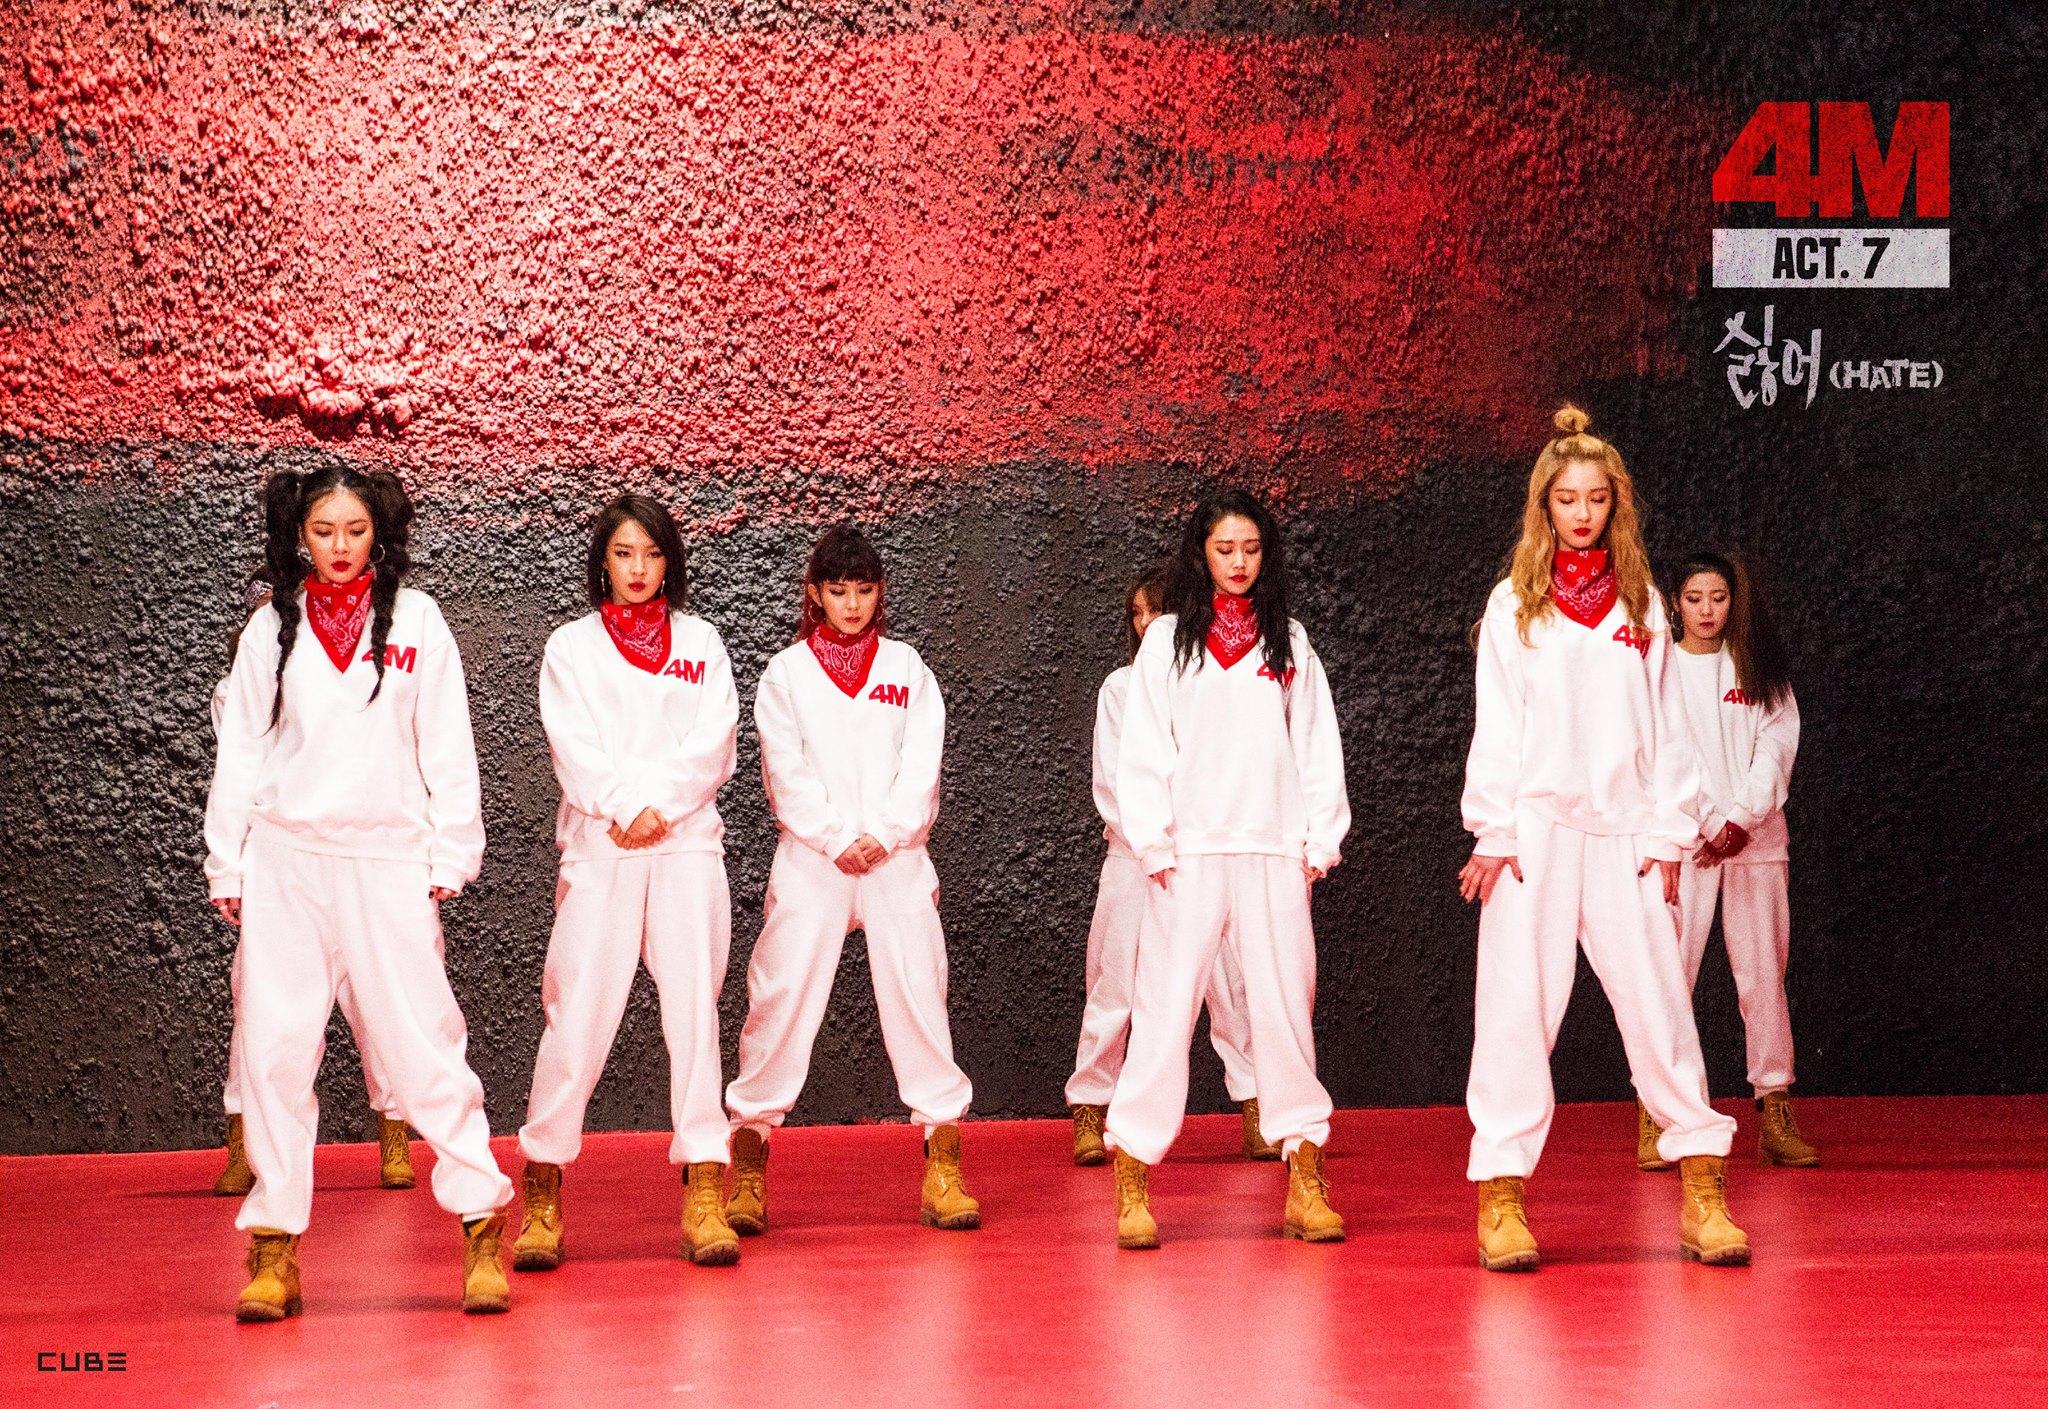 Image: Cube Entertainment